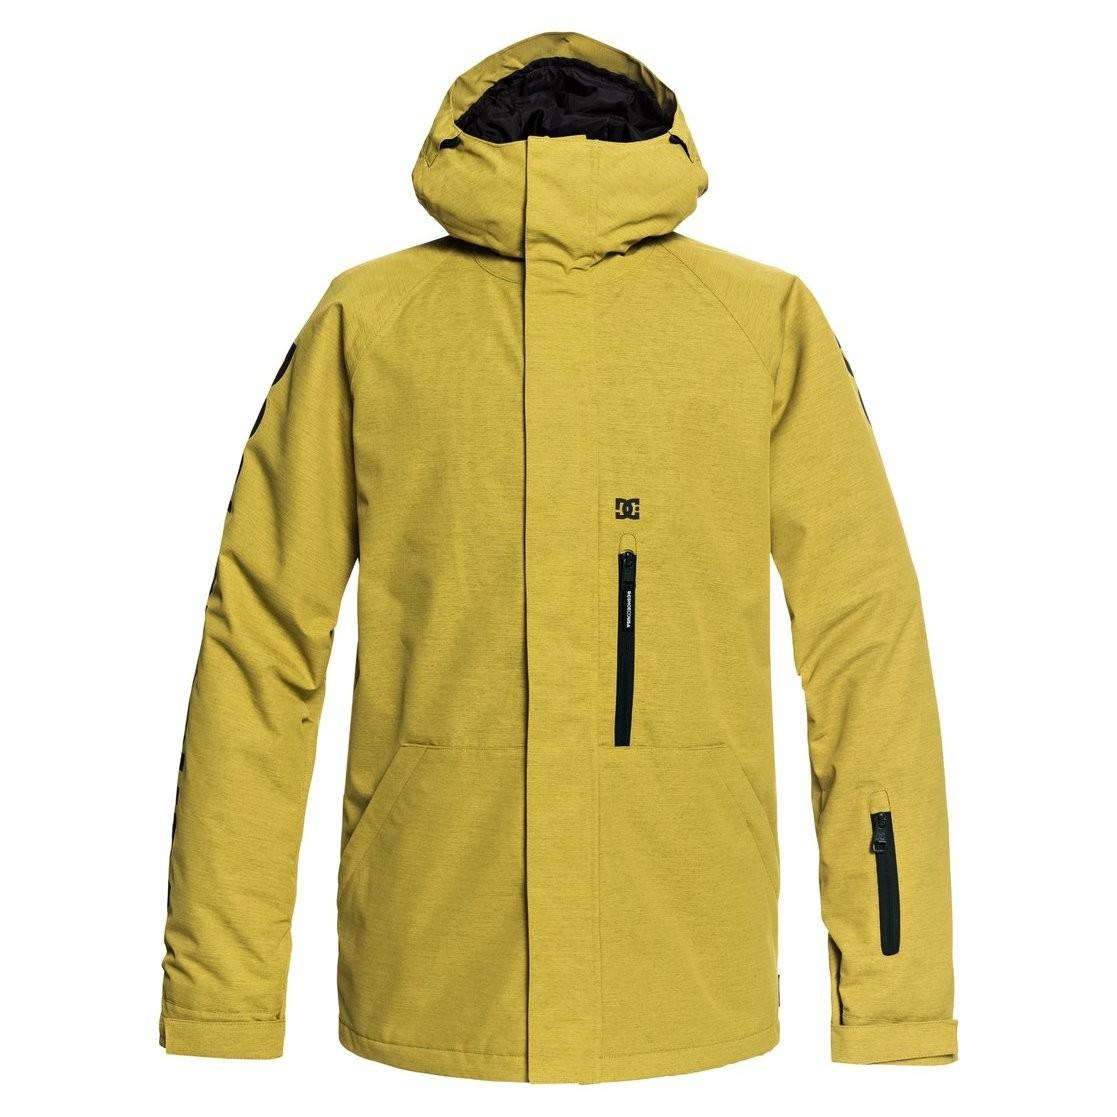 2e95145e3 DC Ripley Golden Rod | Chaqueta de snowboard | Desssliza3